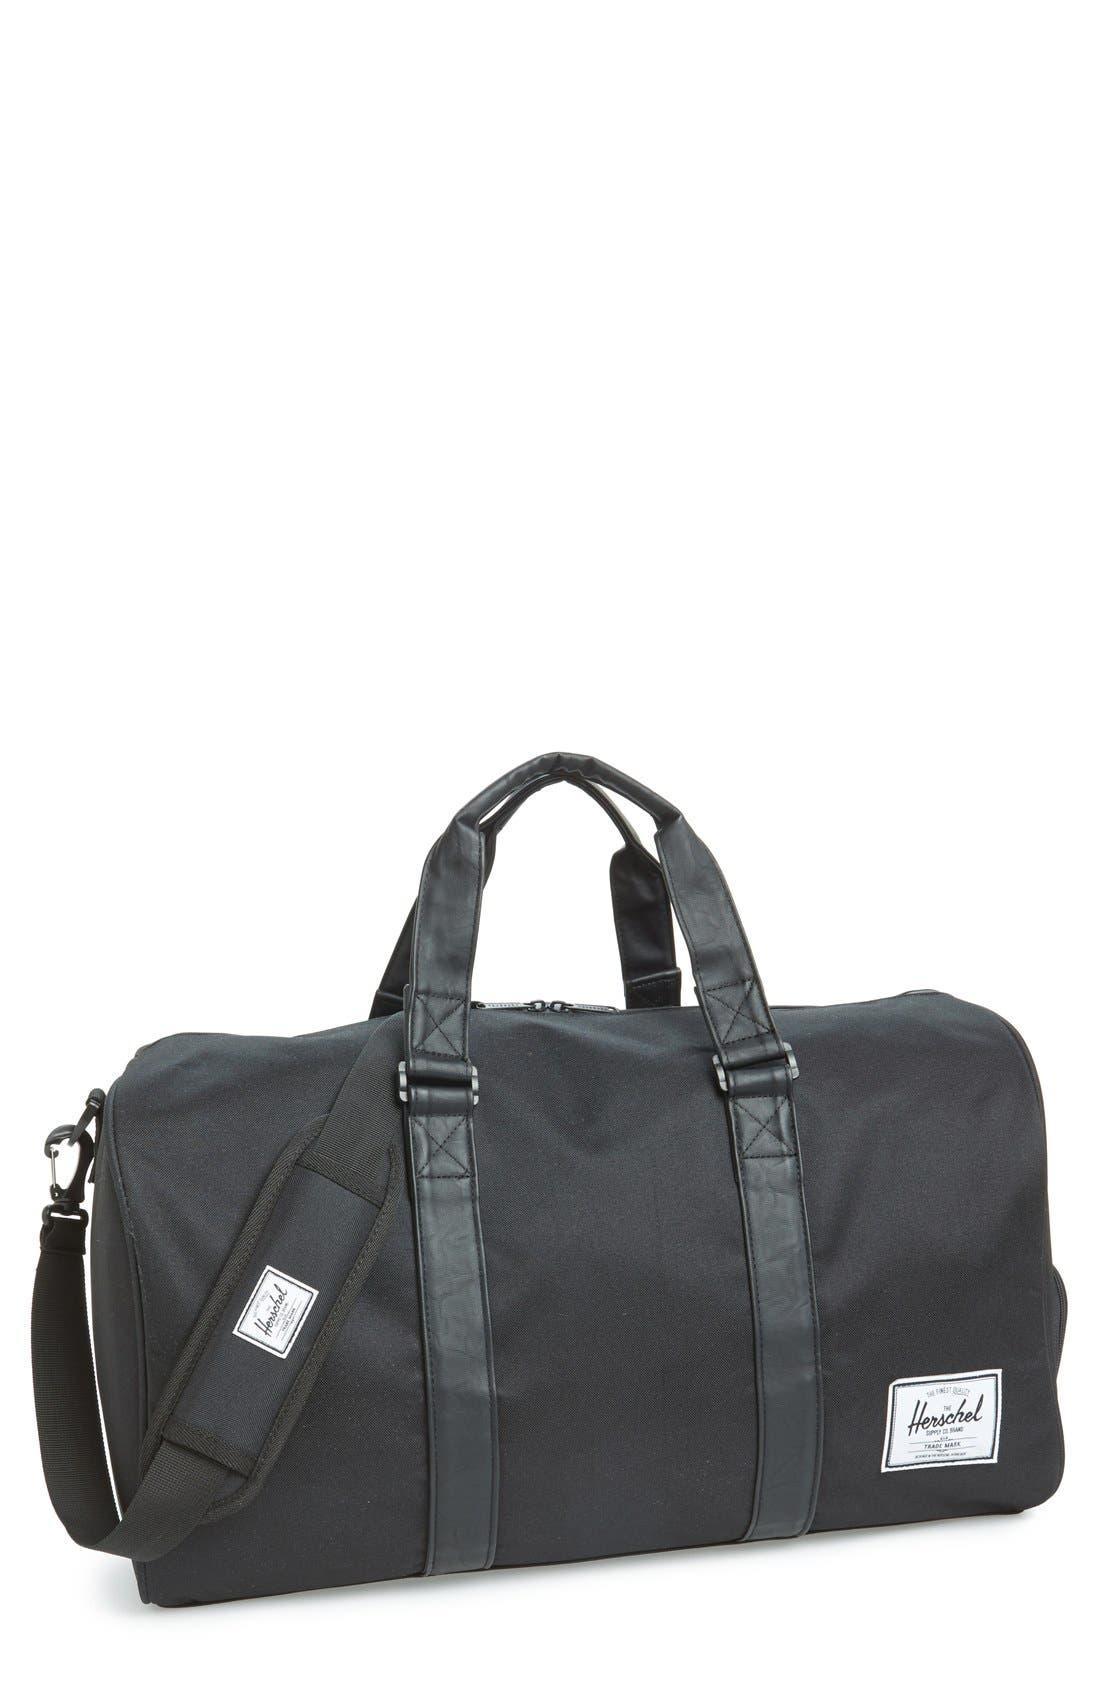 'Novel' Duffel Bag